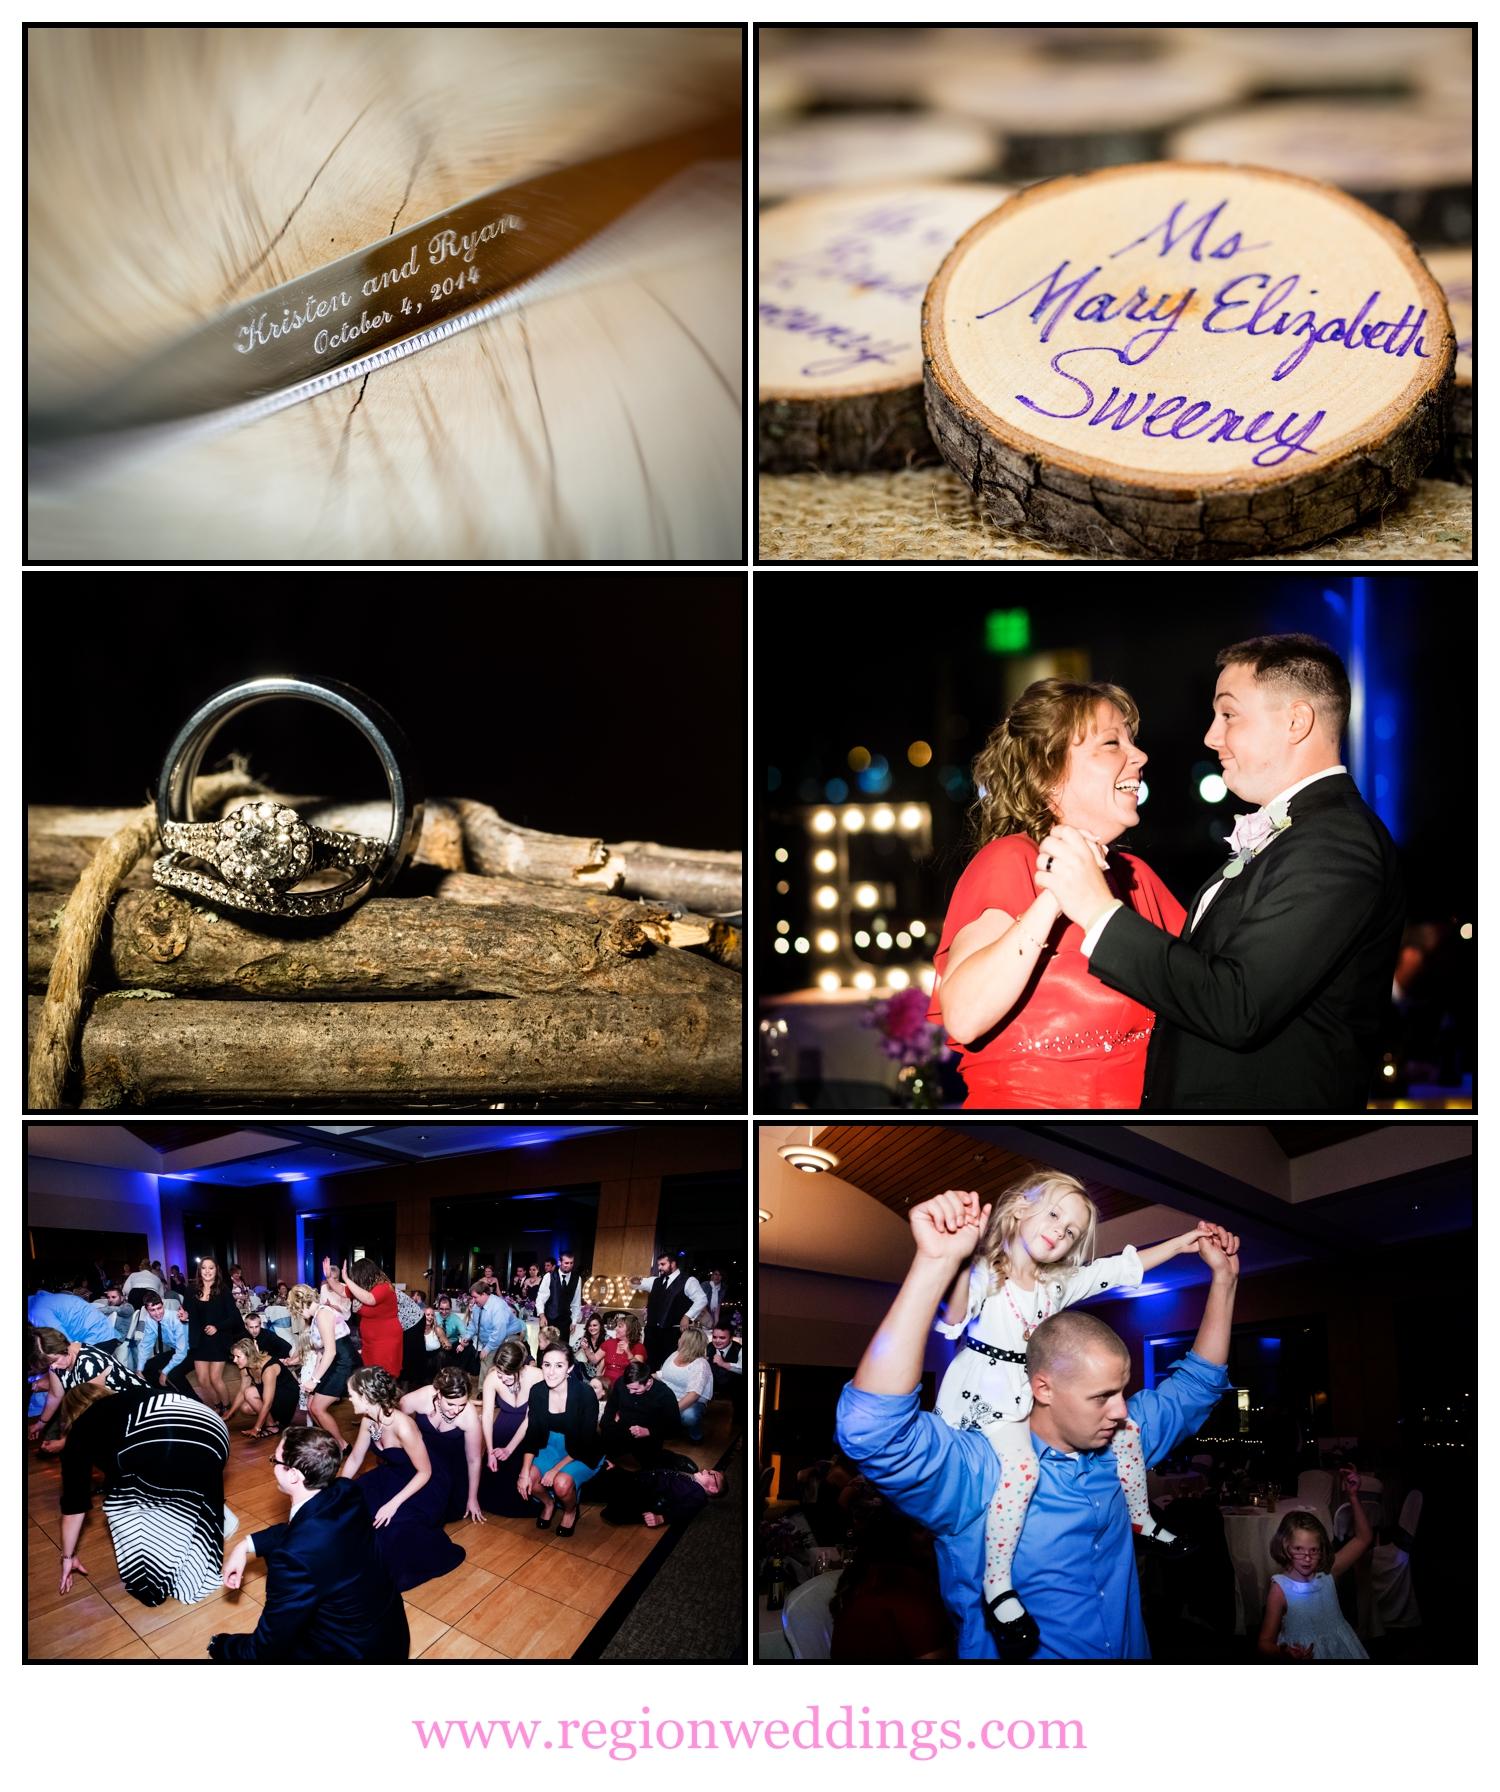 centennial-park-wedding-reception-collage1.jpg